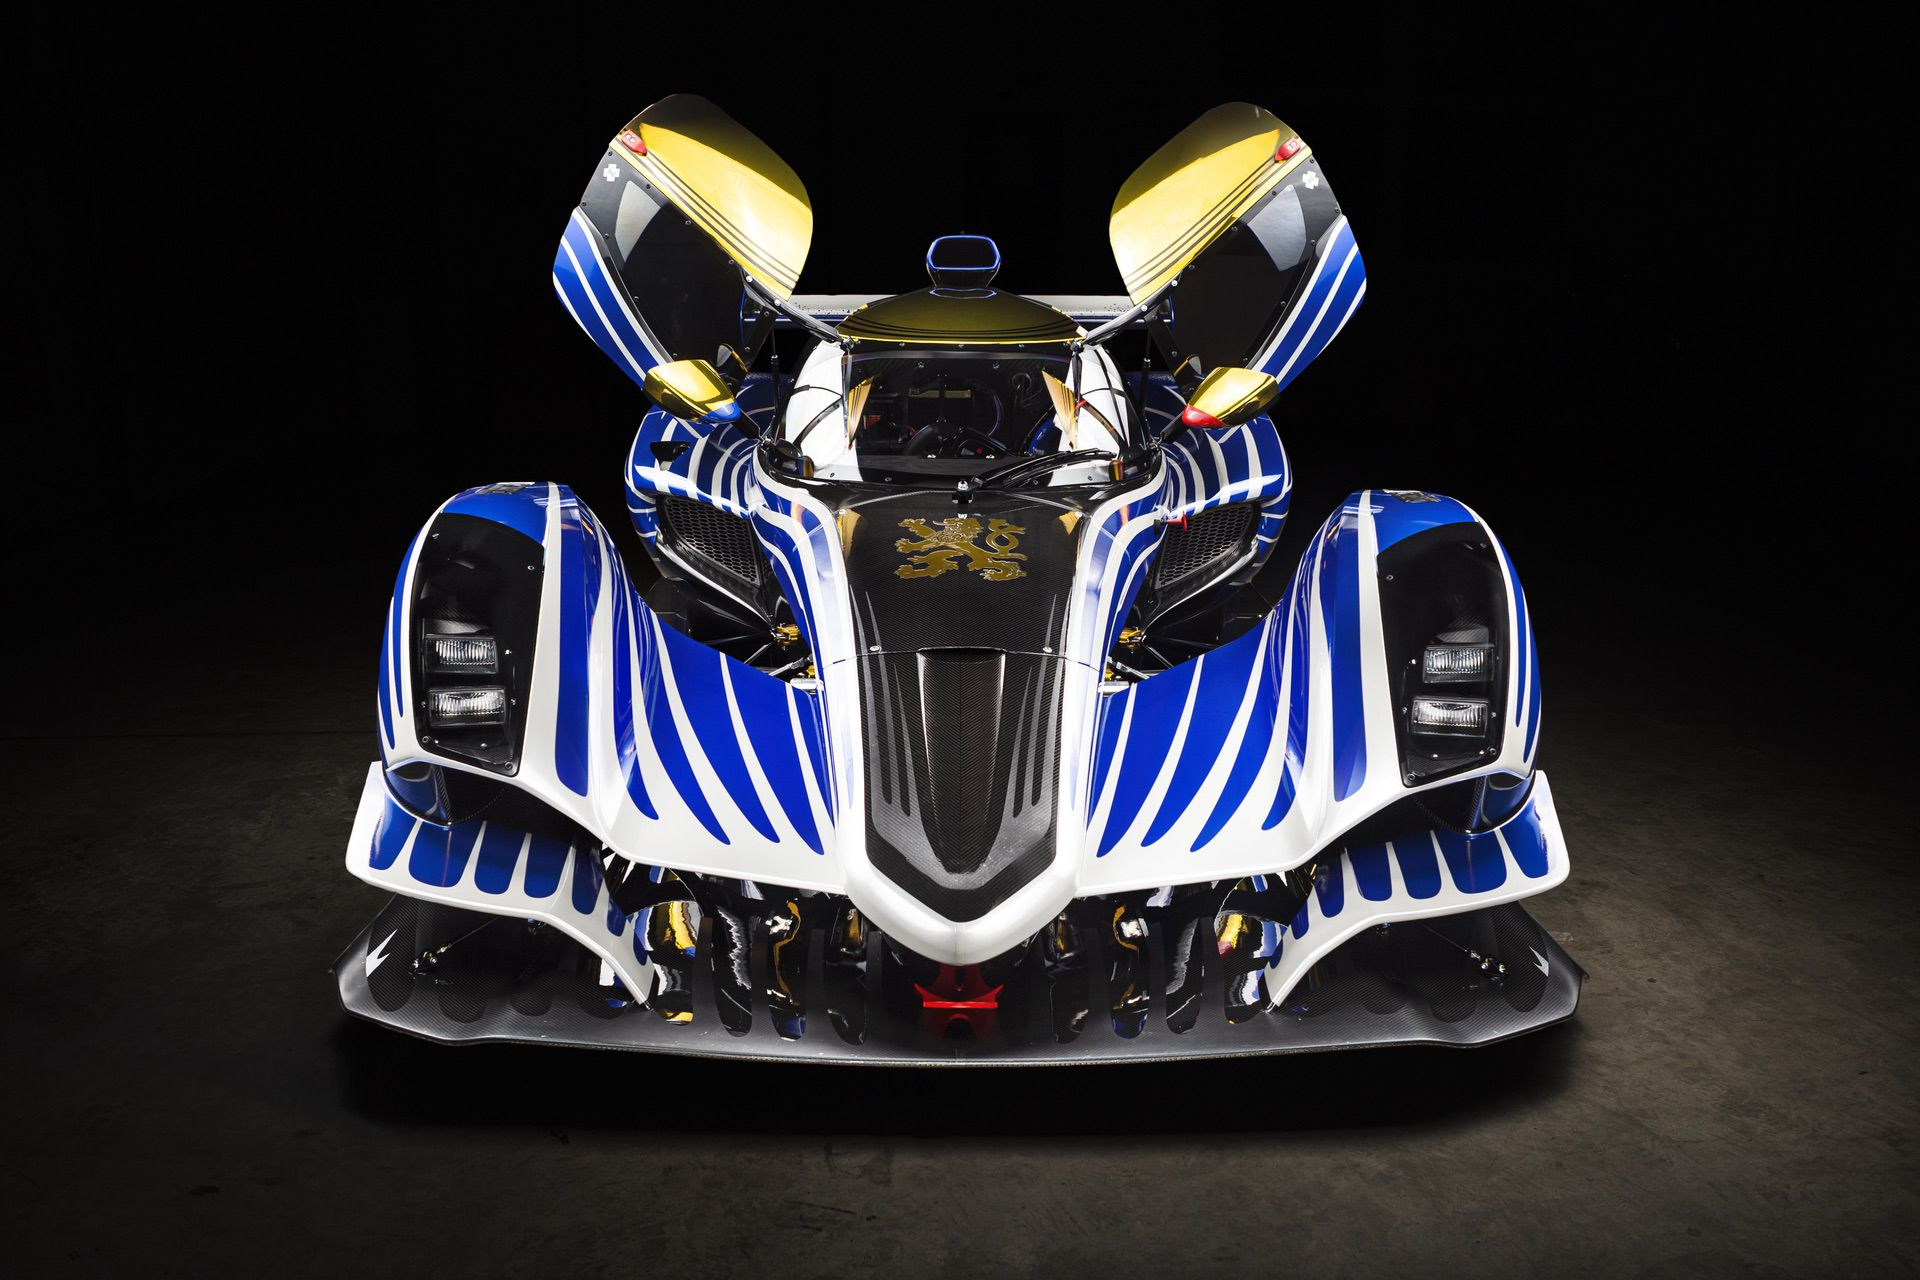 Praga_R1_Frank_Stephenson_racing_livery-0017